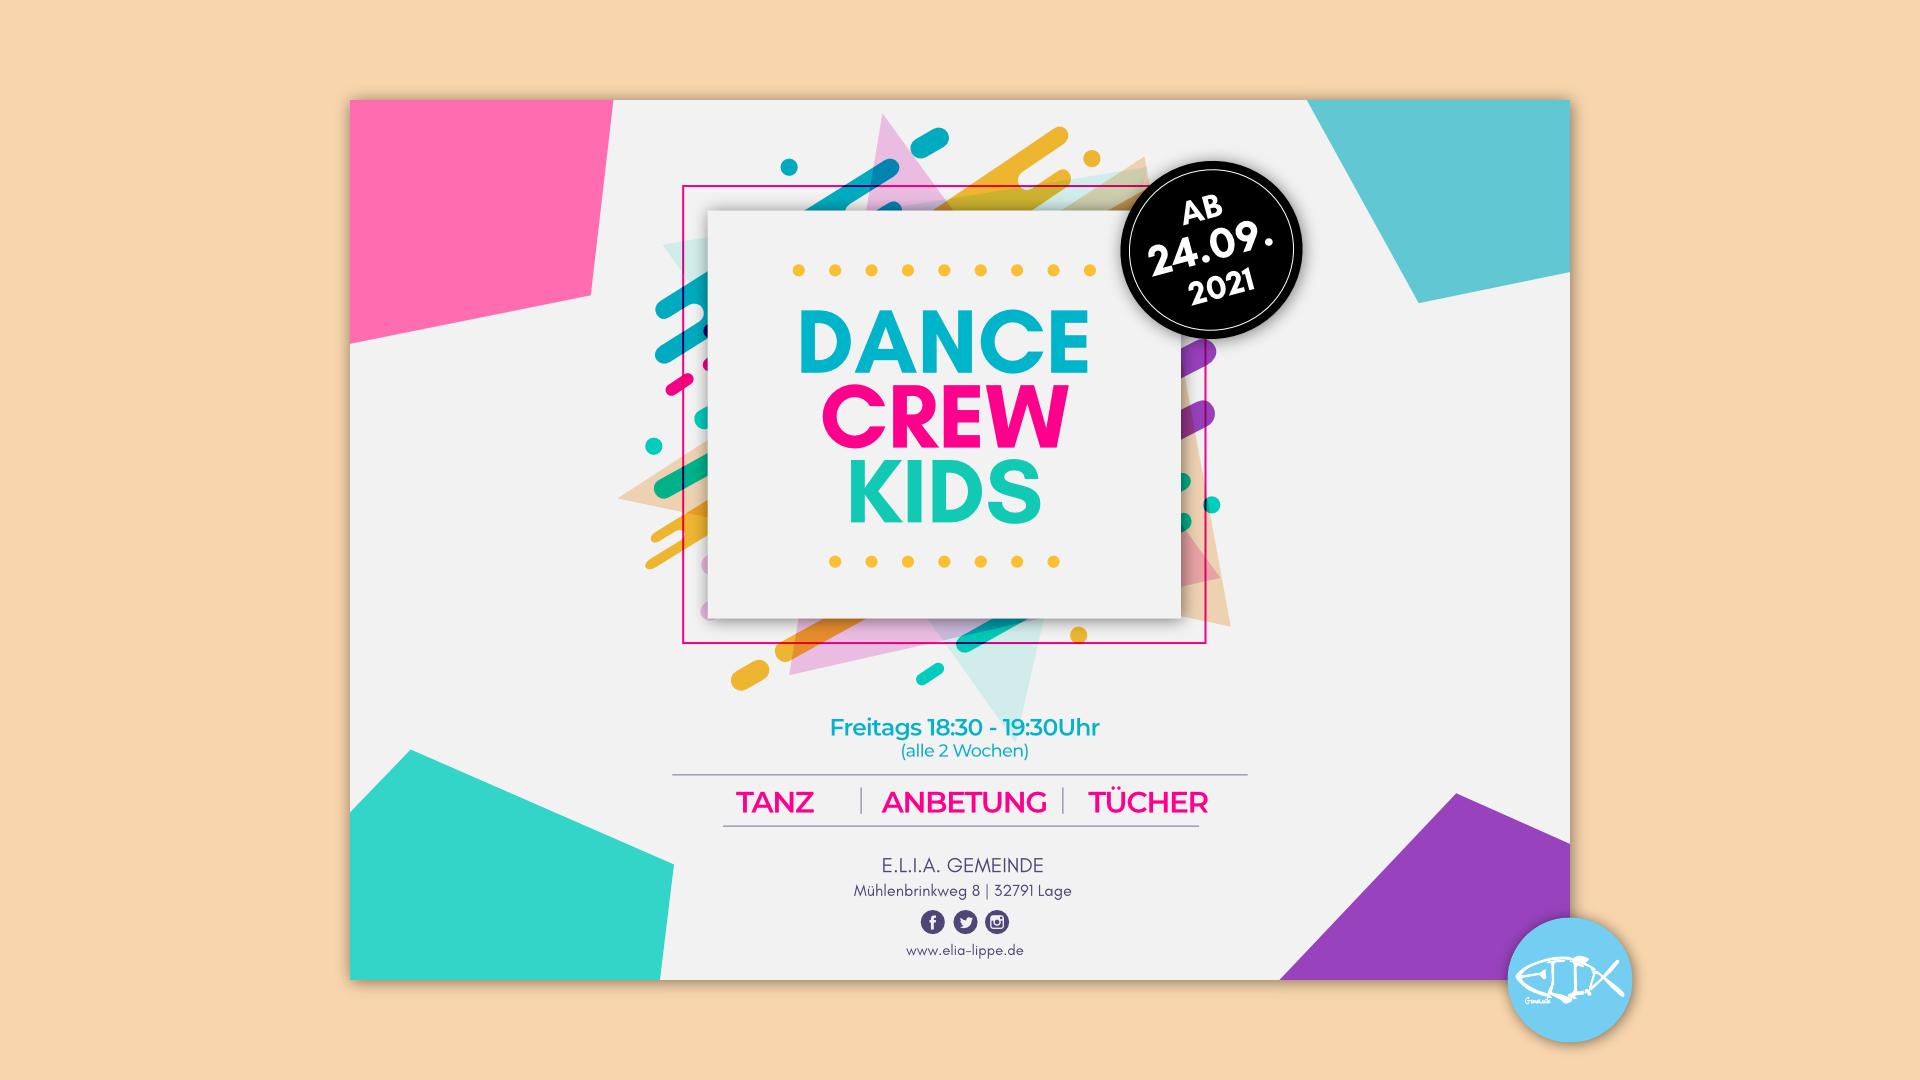 DanceCrewKids ab dem 24.09.2021